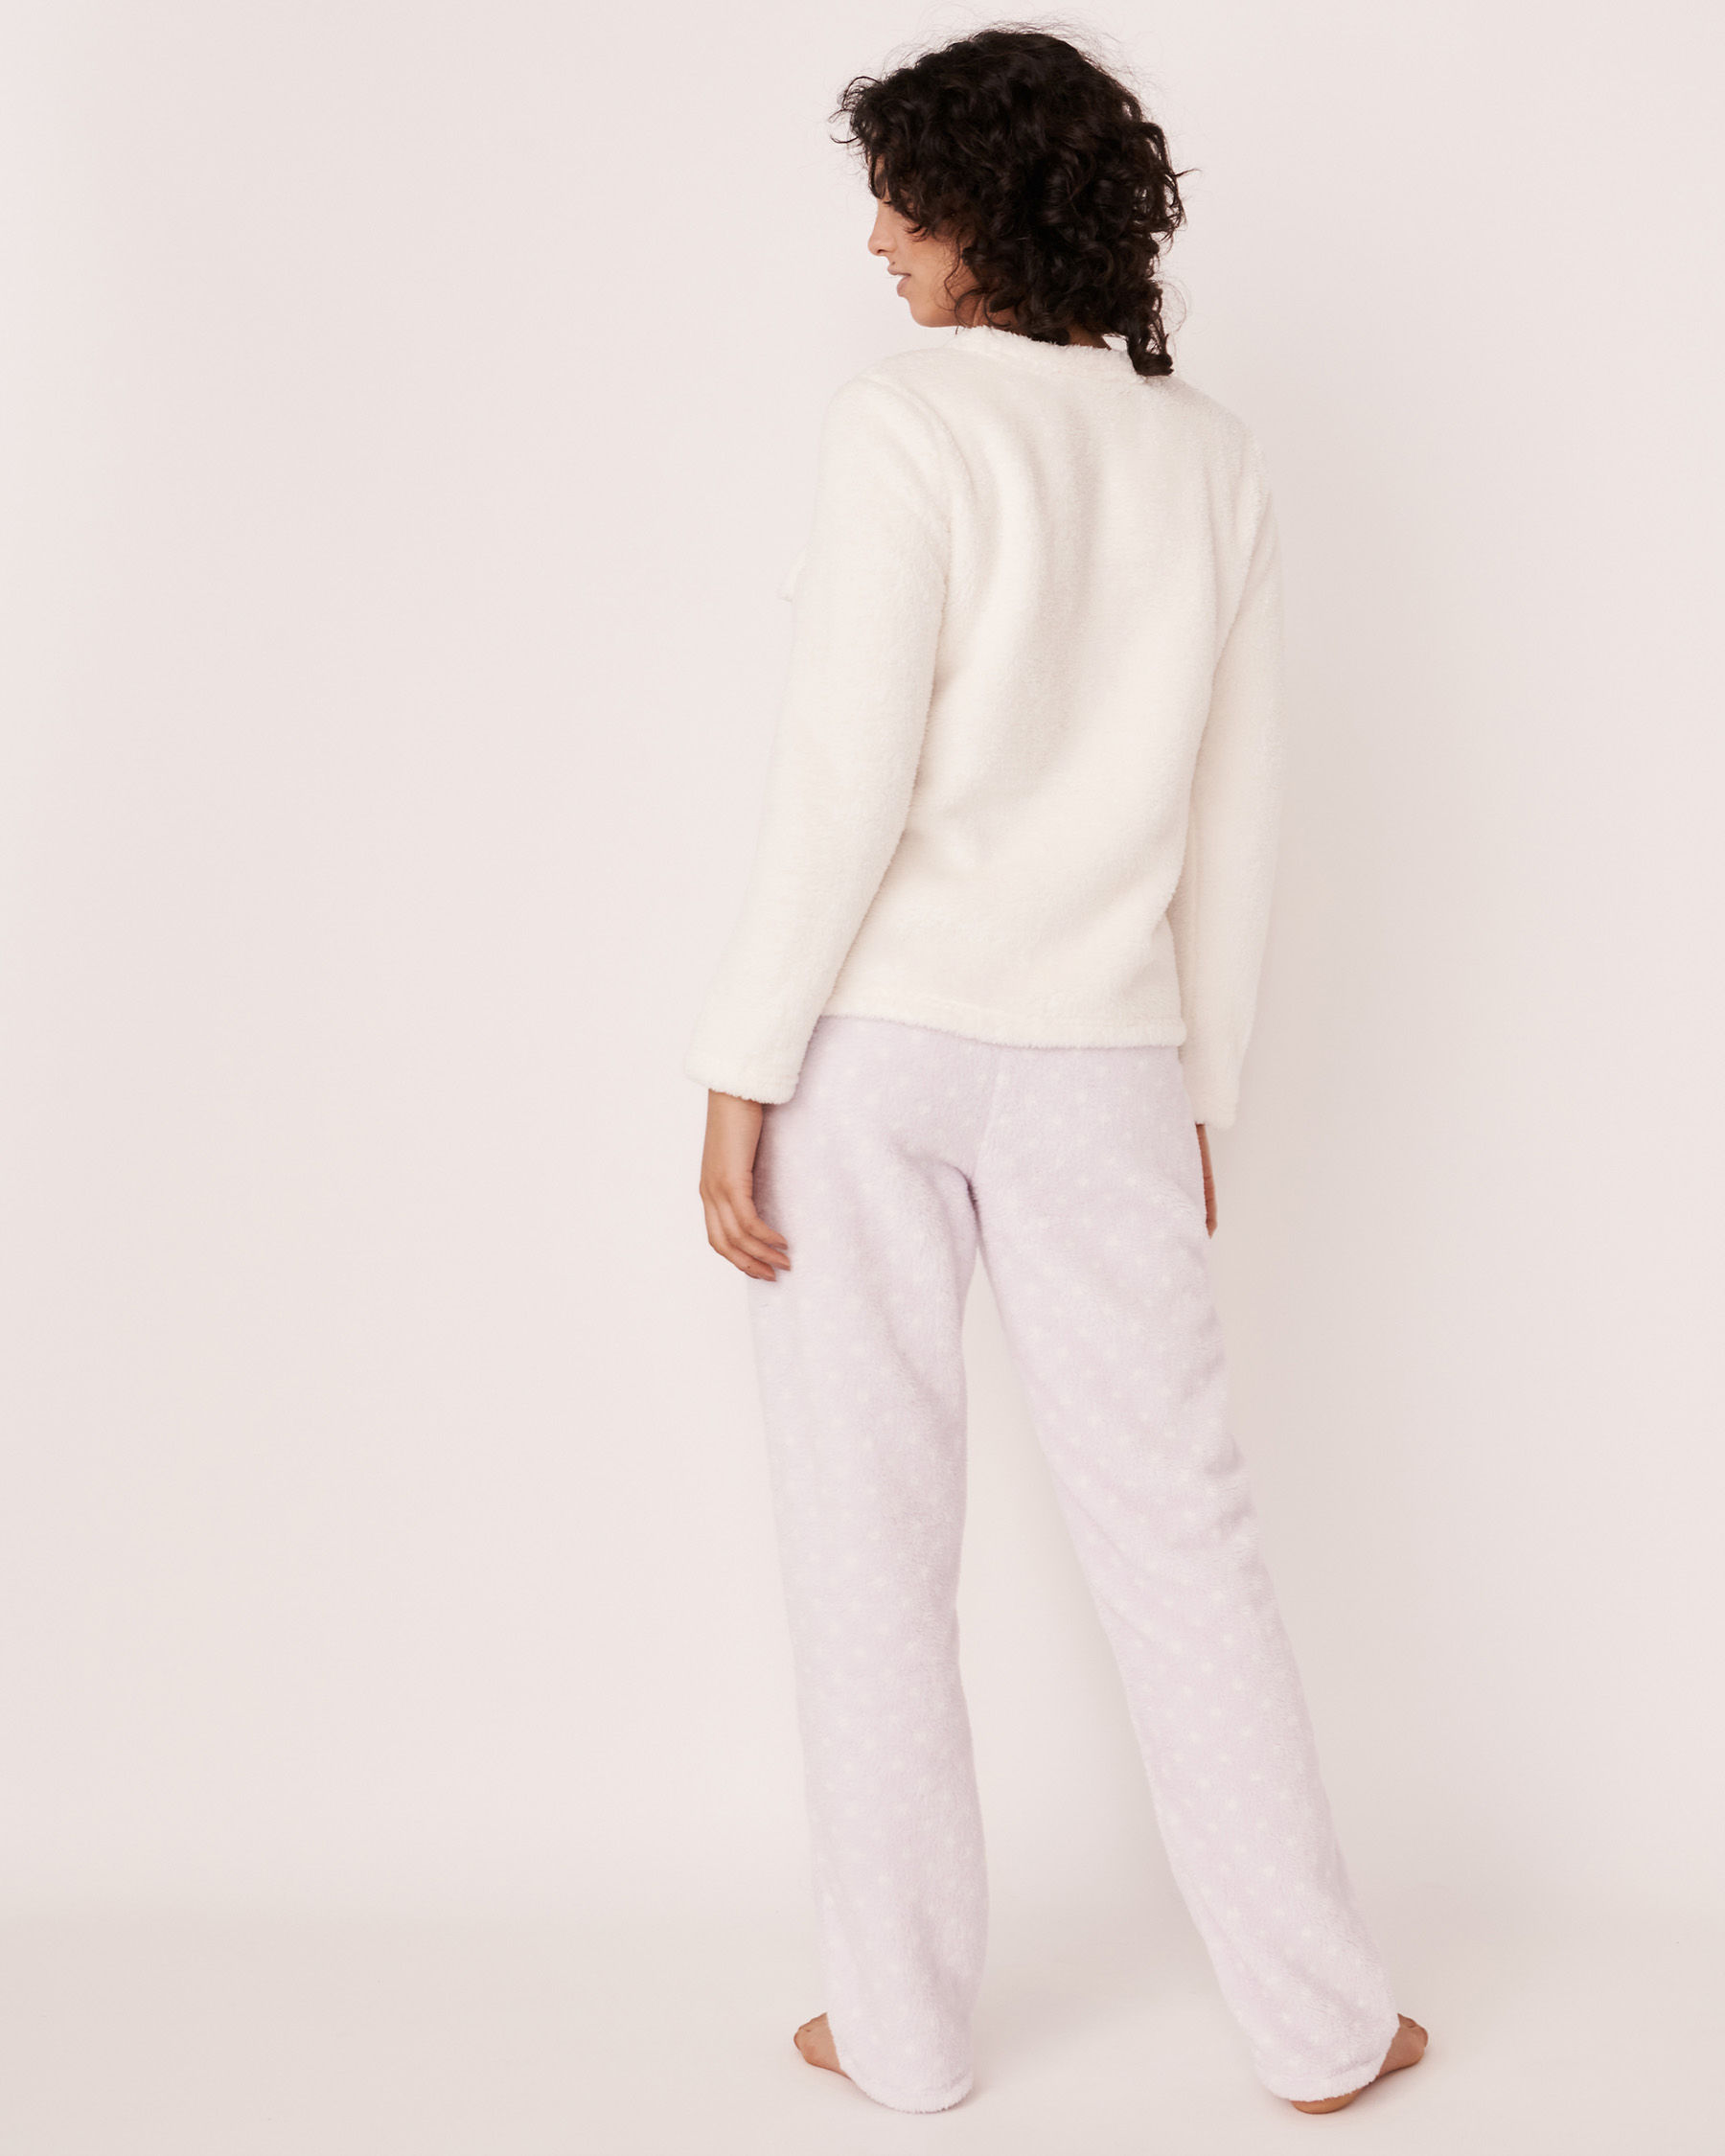 LA VIE EN ROSE Ensemble pyjama mouton 3D Blanc 40400009 - Voir3